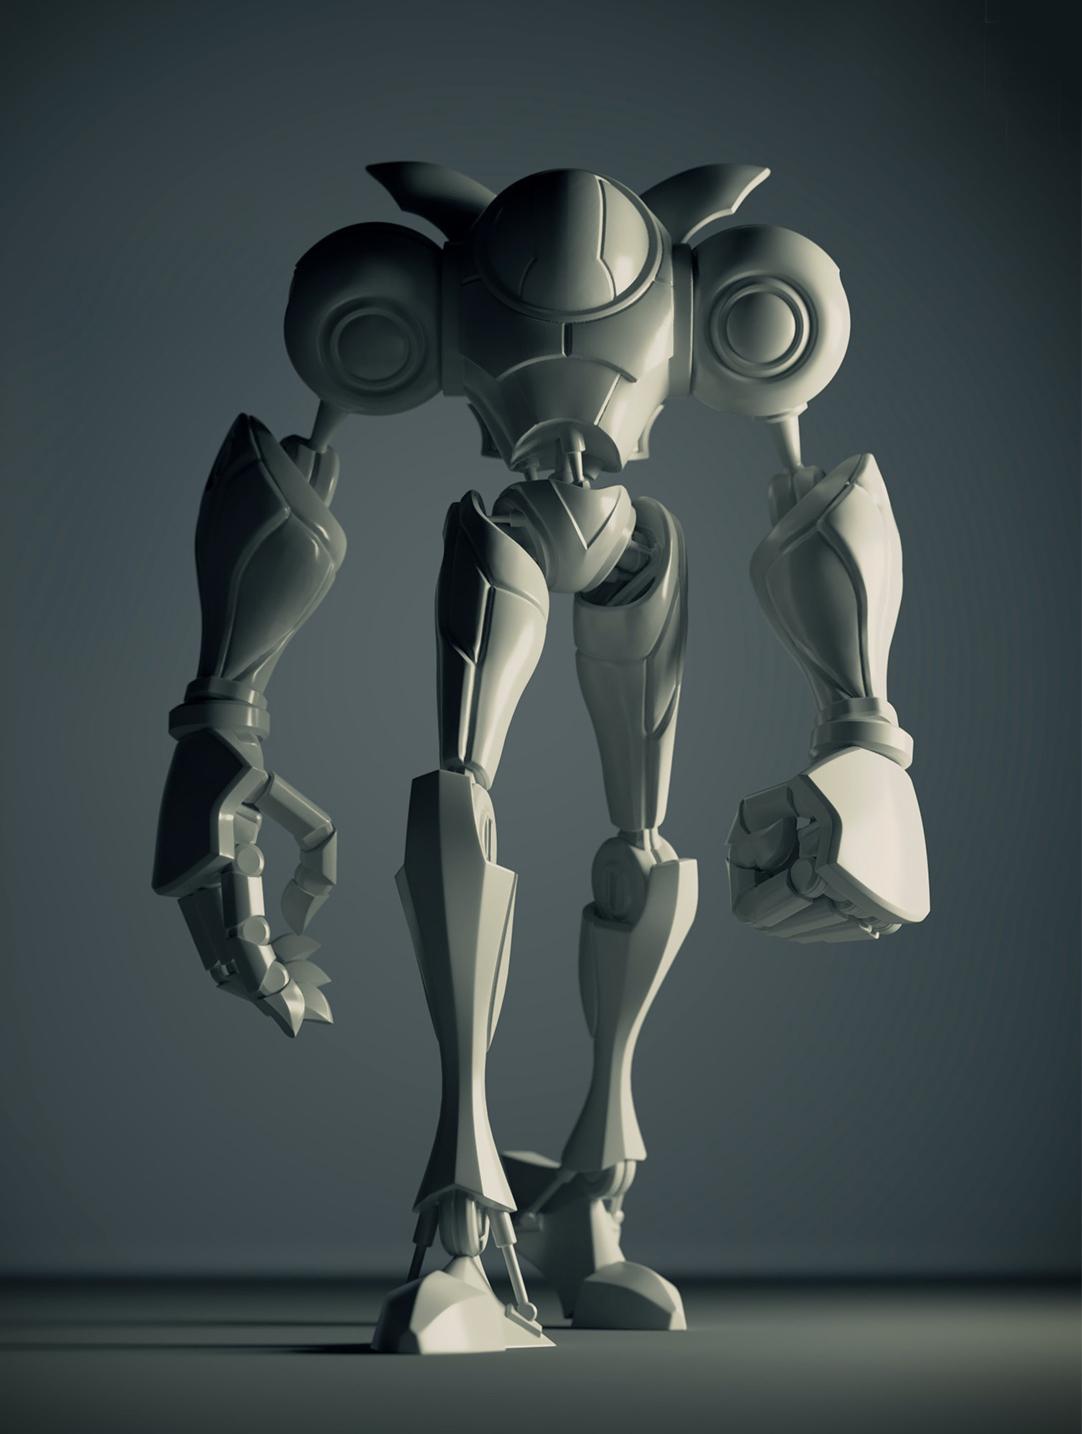 Robot Model and Print